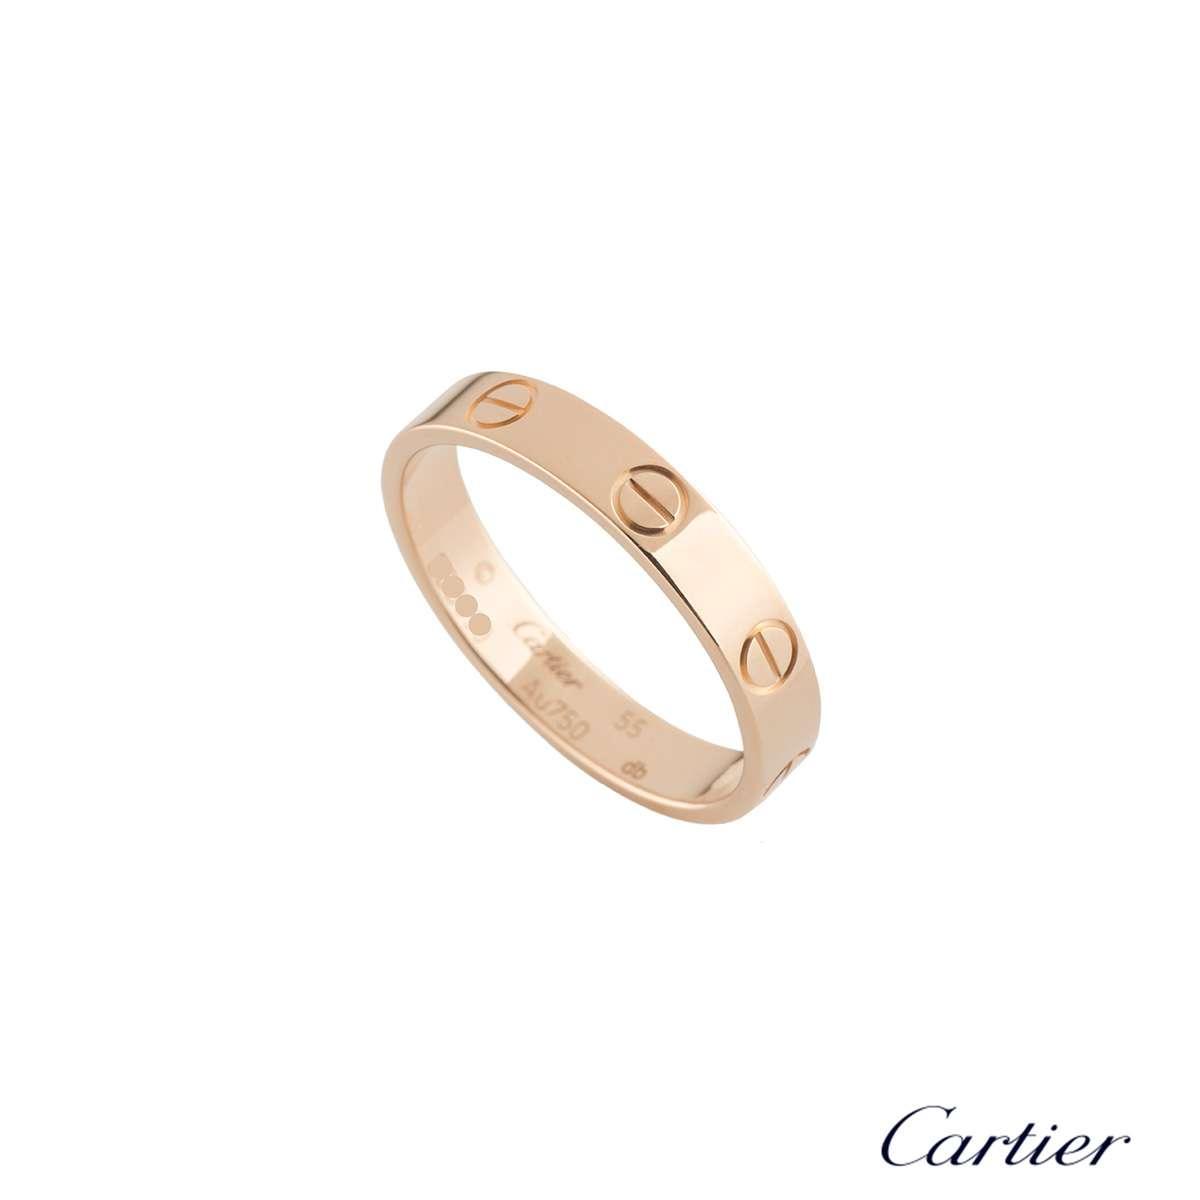 Cartier Rose Gold Plain Love Wedding Band Size 55 B4085255